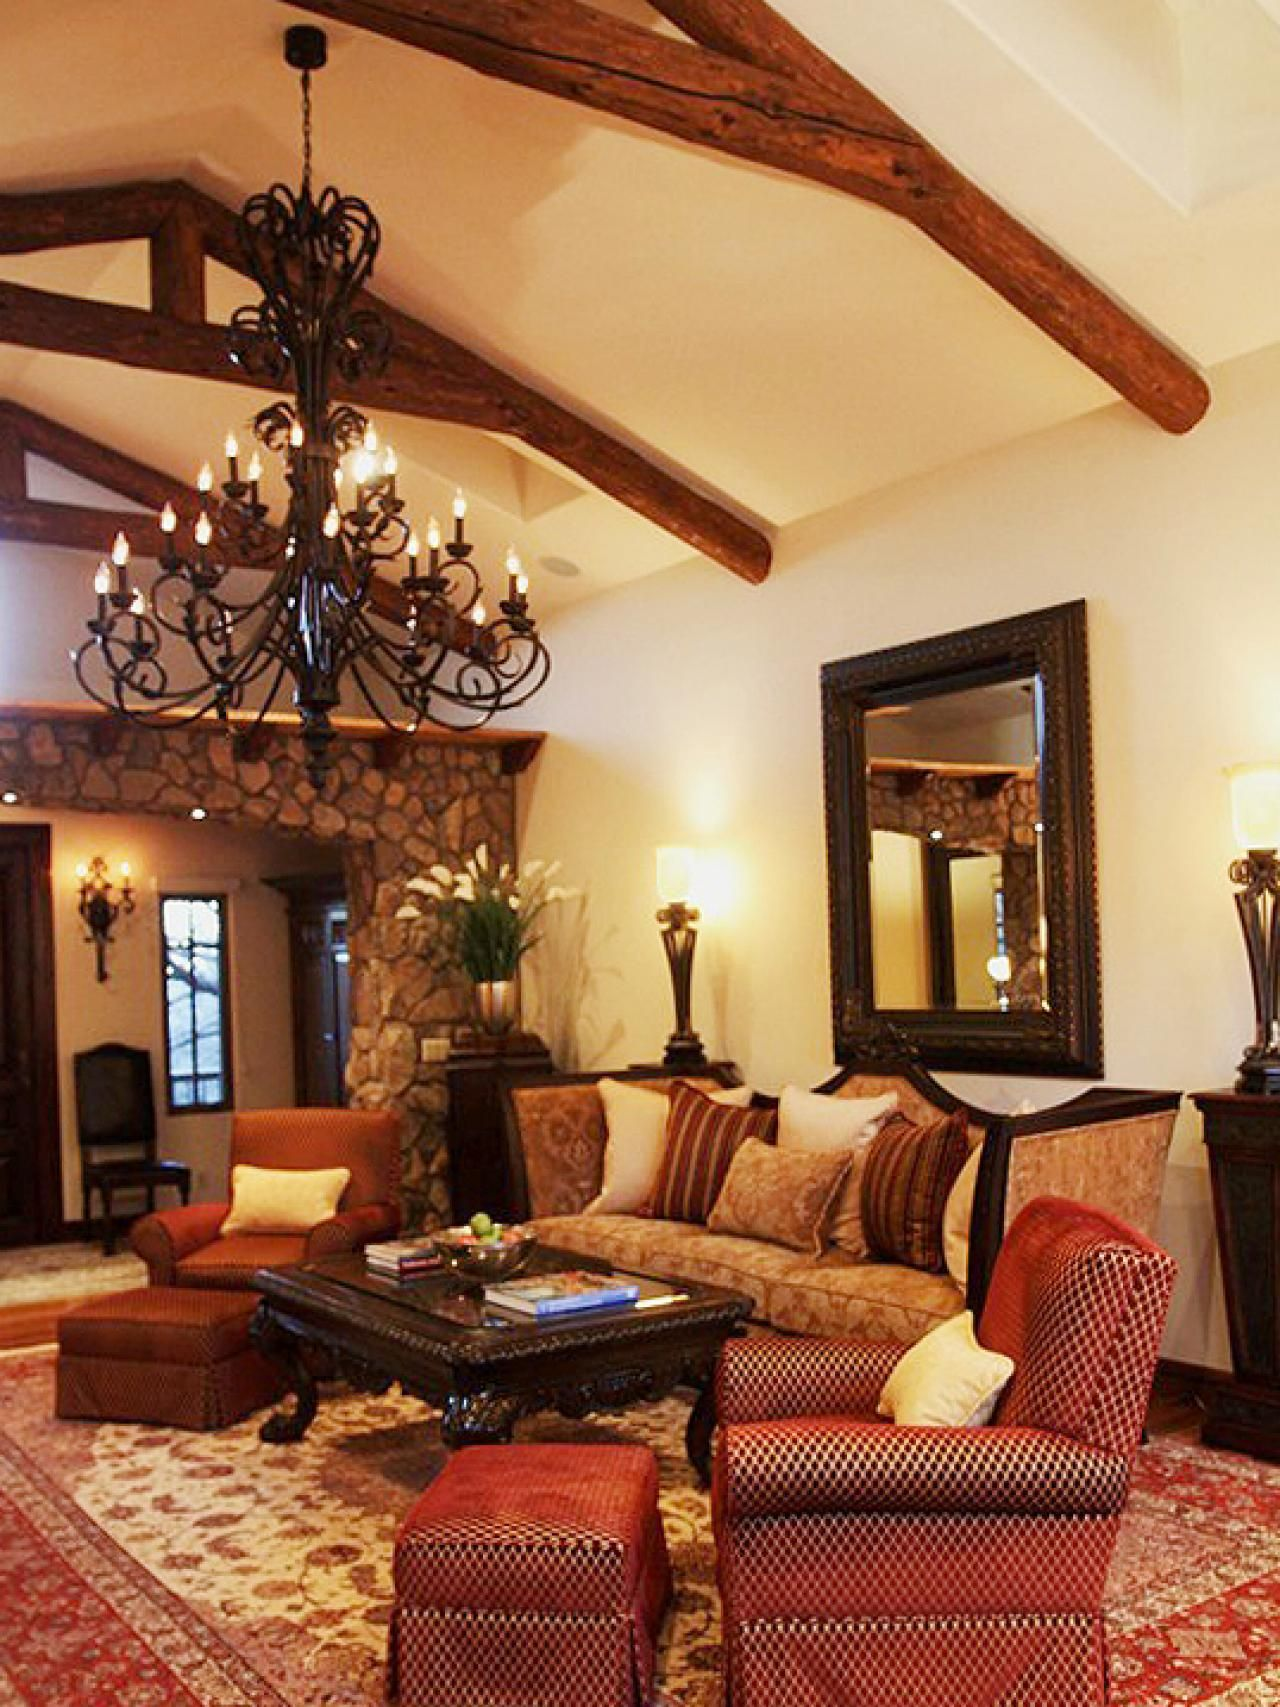 Spanish Style Living Room Furniture Diy Seating Image Of Design Modern